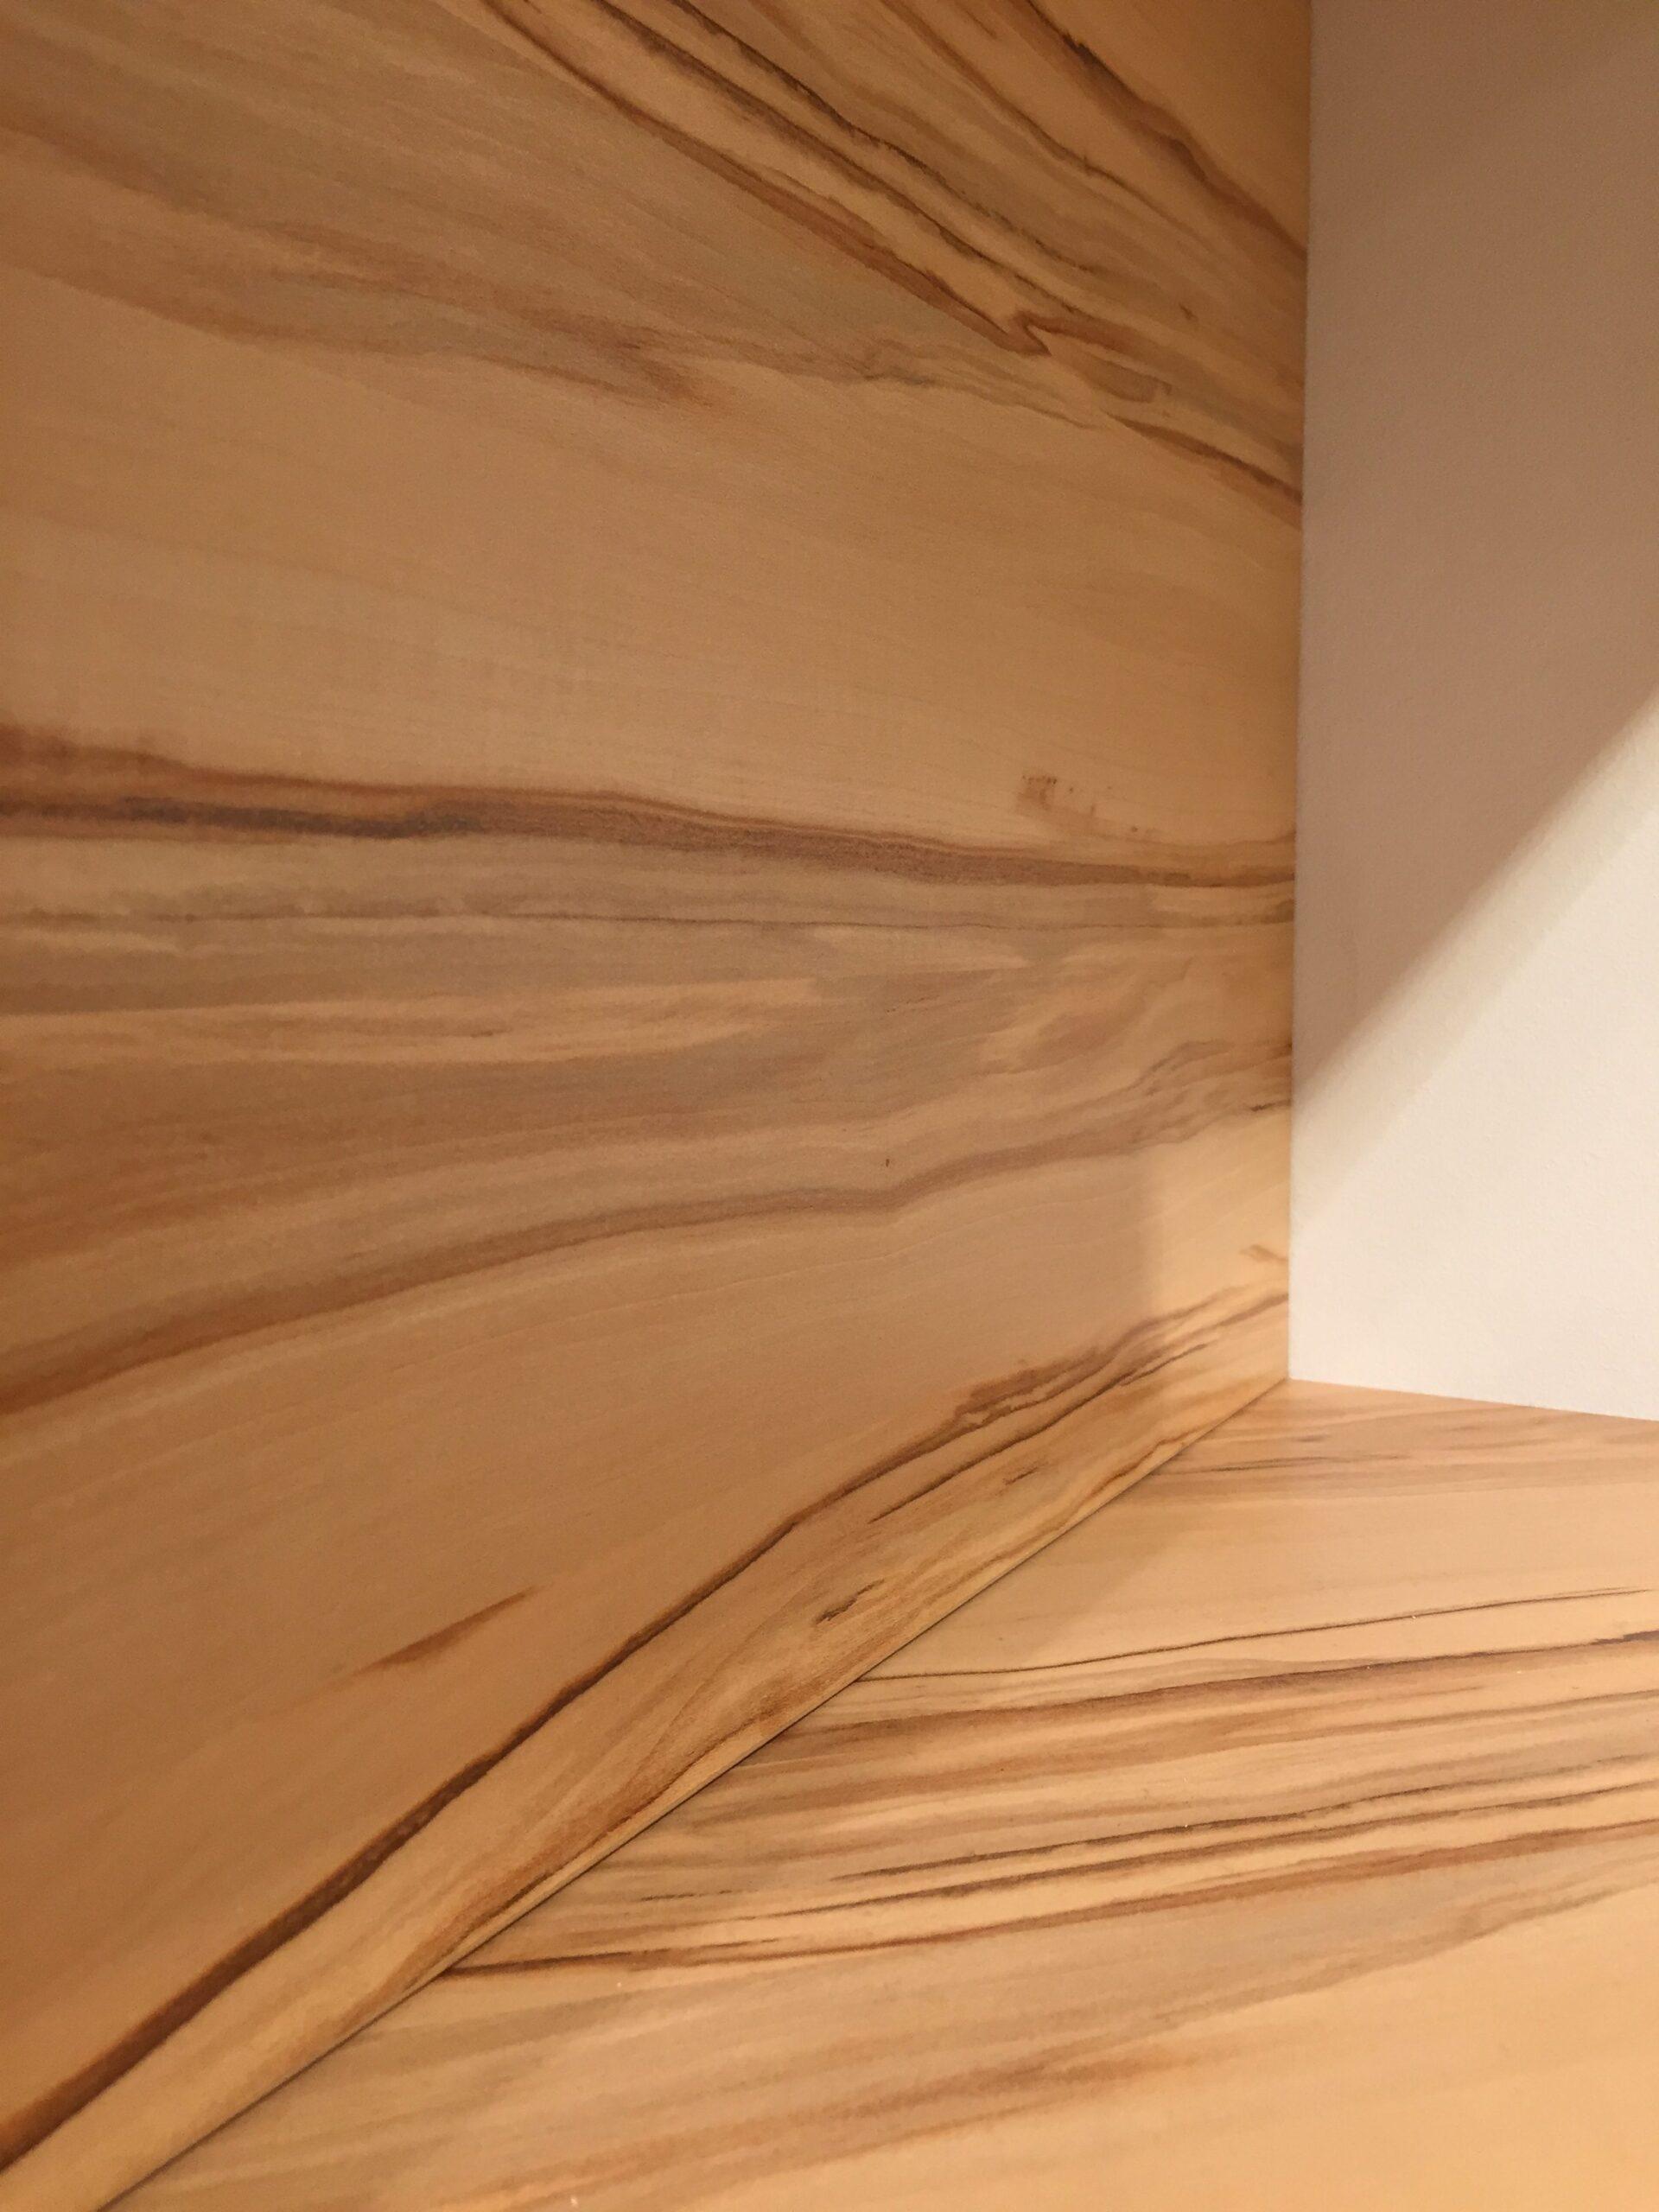 Full Size of Fliesen Rückwand Küche Welche Rckwand In Der Kche Kchen Info Rosa Betonoptik Schneidemaschine Modulküche Ikea Kosten Wasserhähne Arbeitsschuhe Teppich Wohnzimmer Fliesen Rückwand Küche